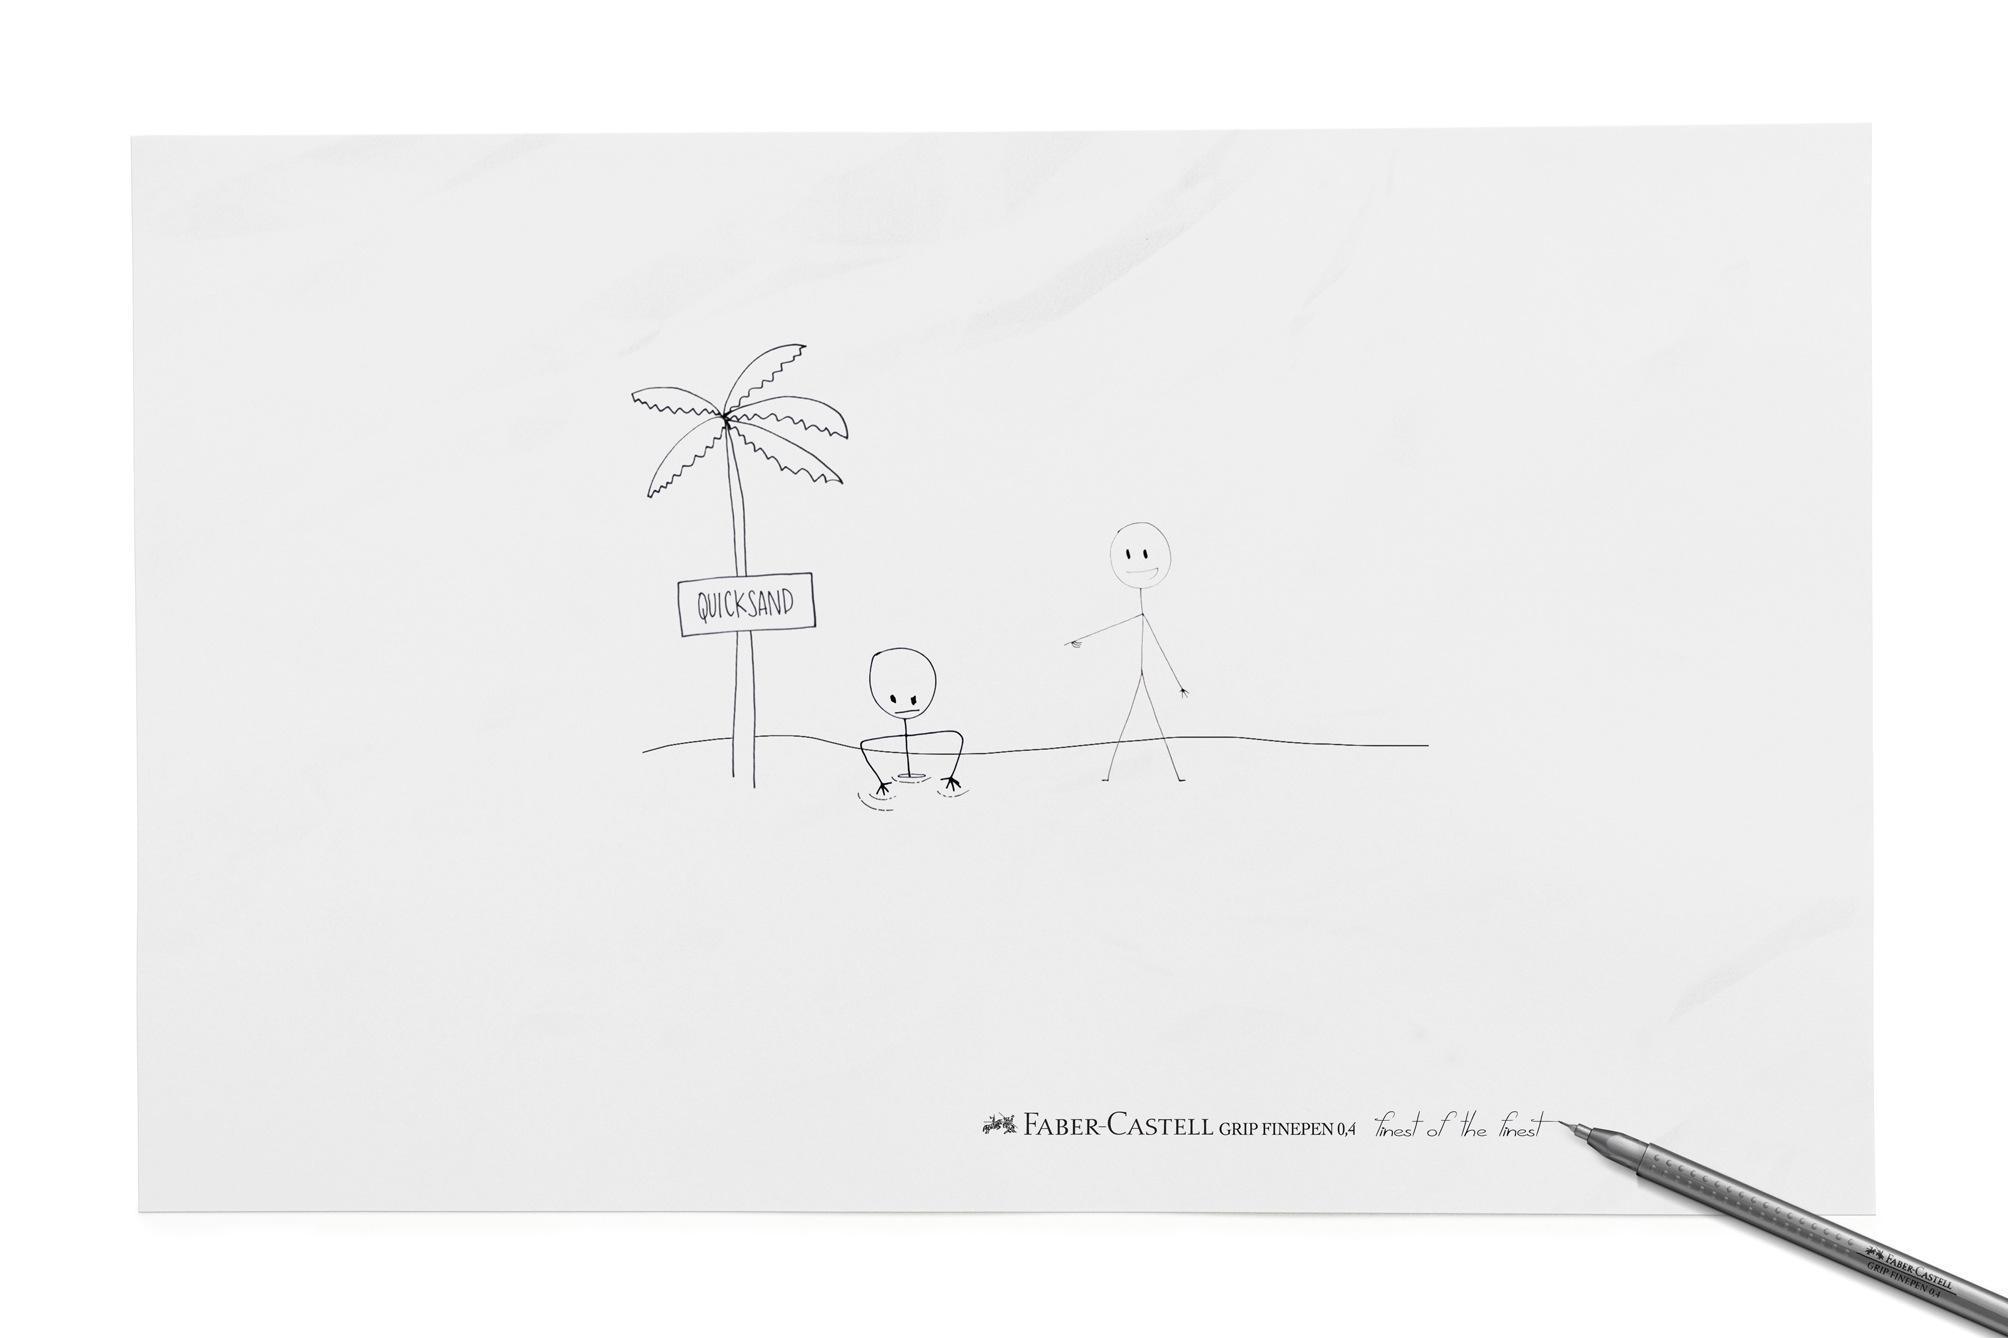 Faber-Castell Print Ad -  Quicksand